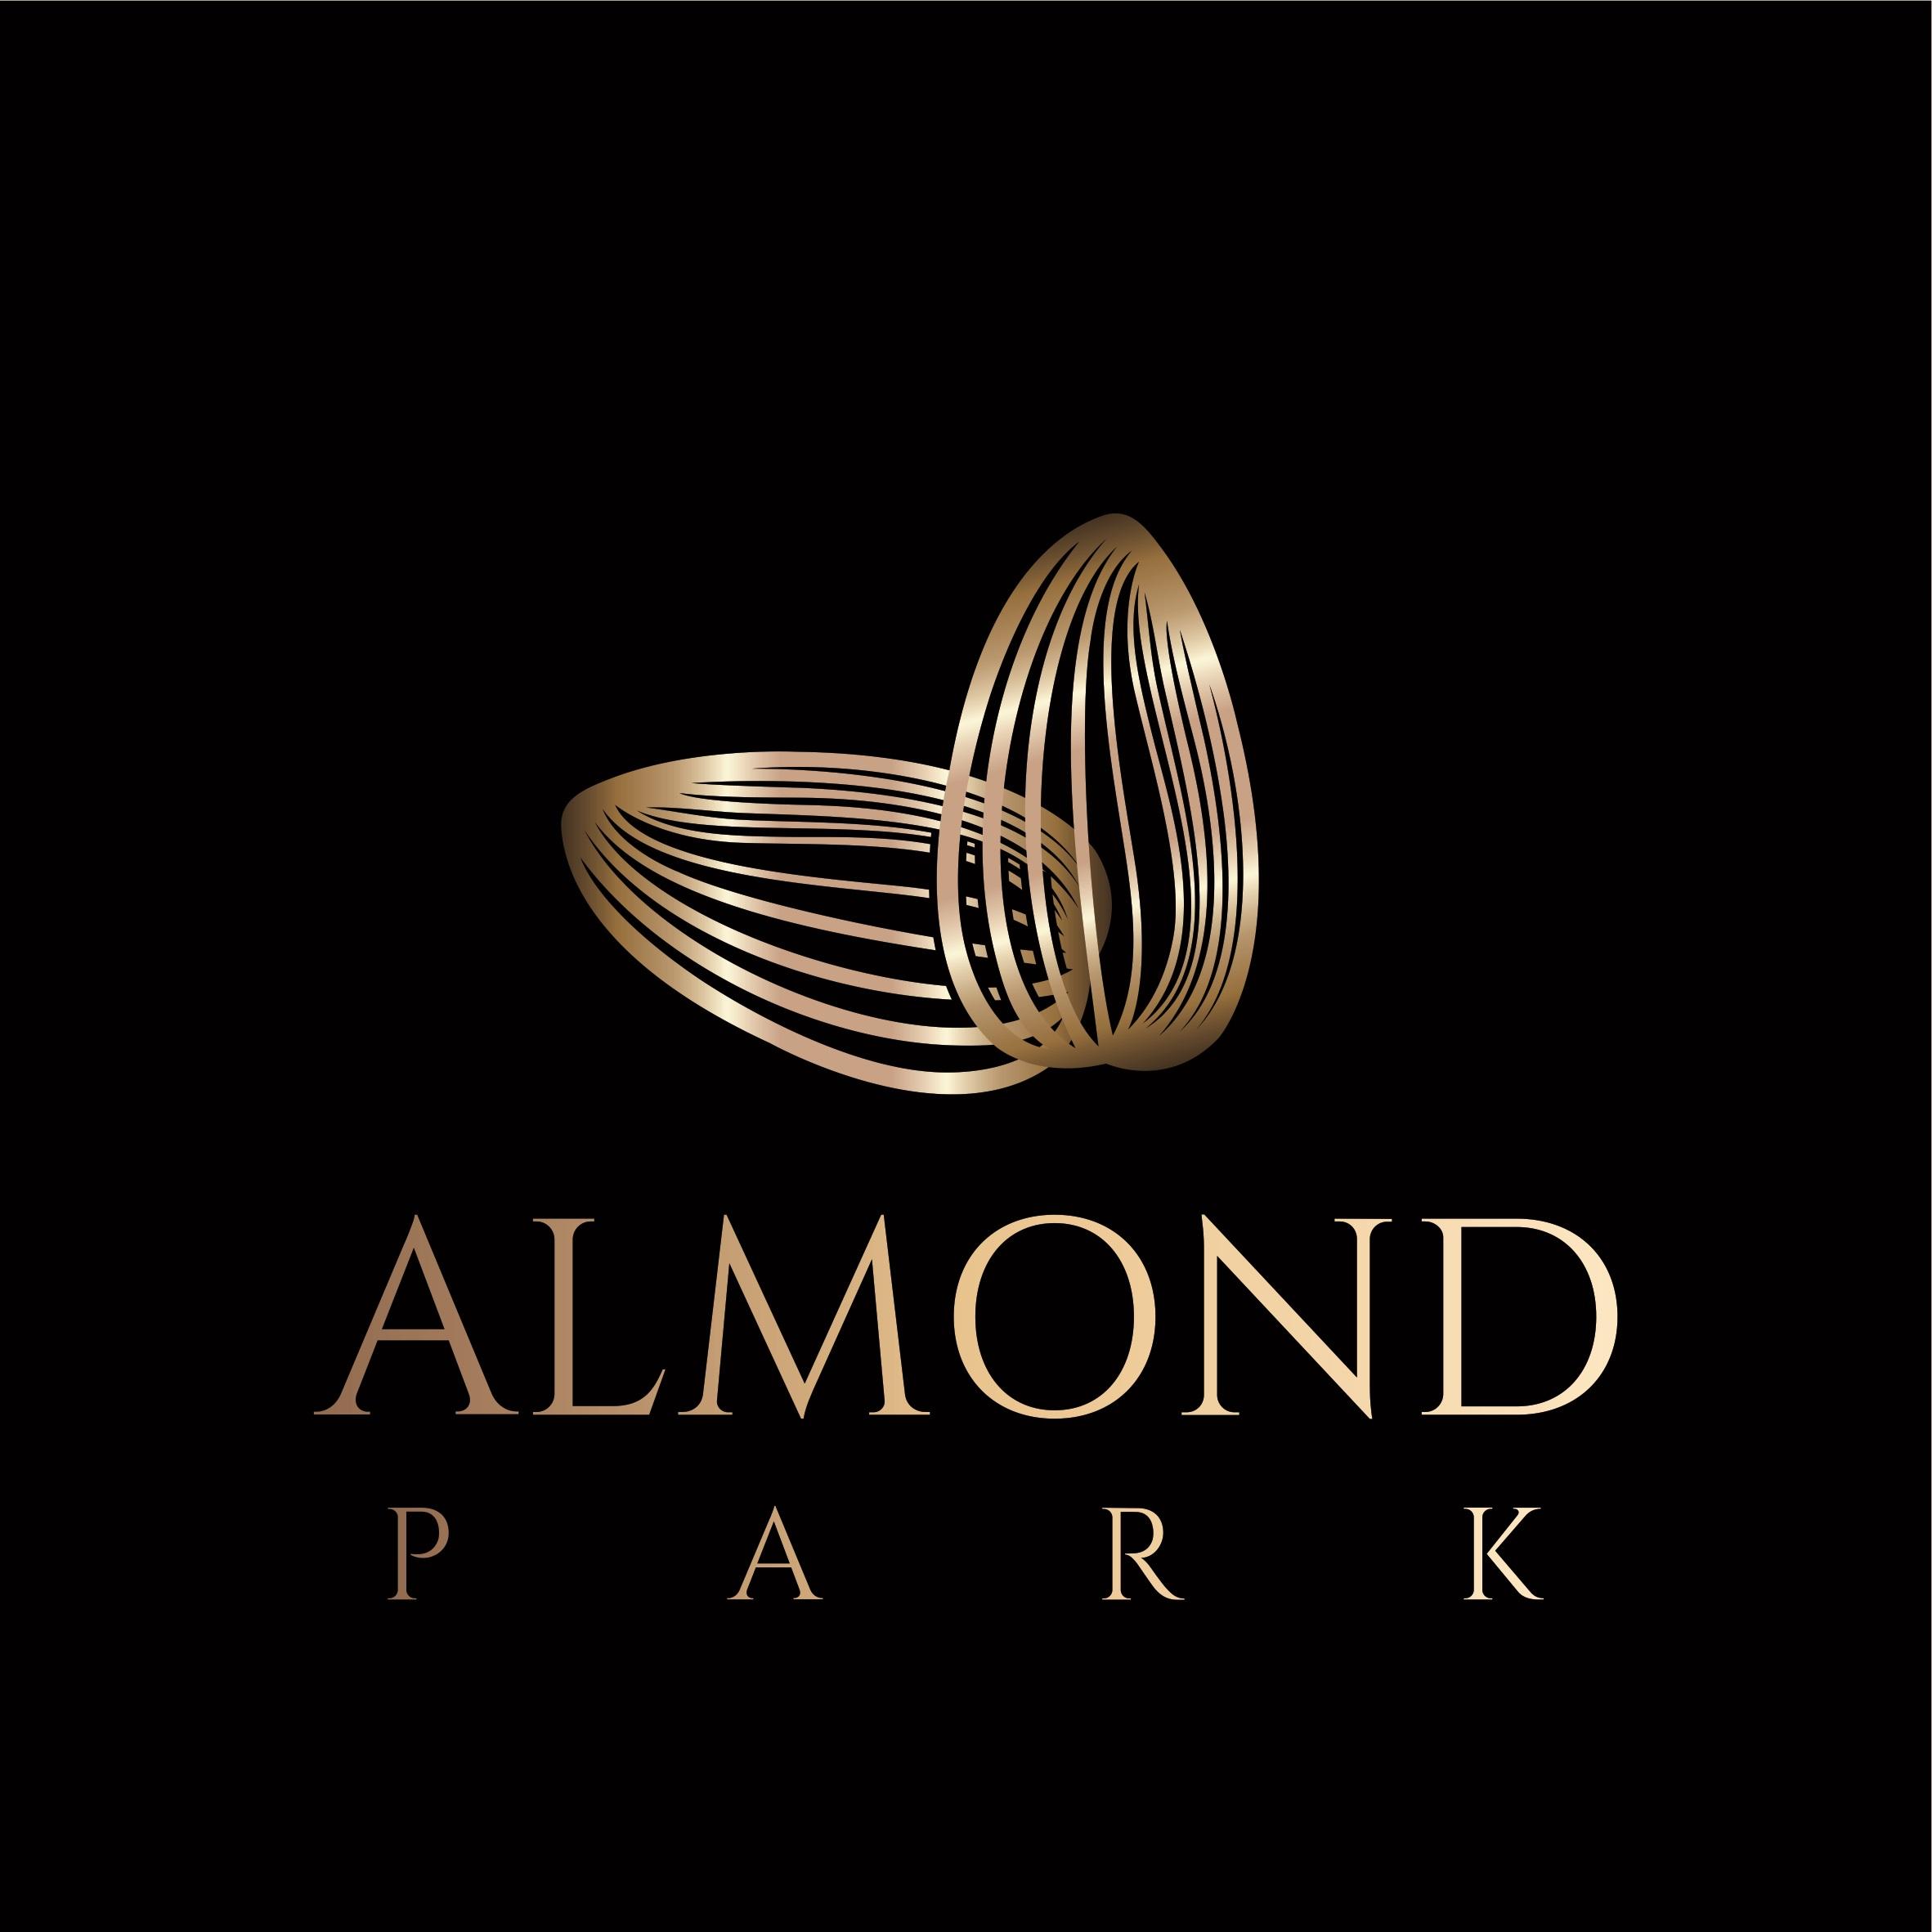 Almond Park